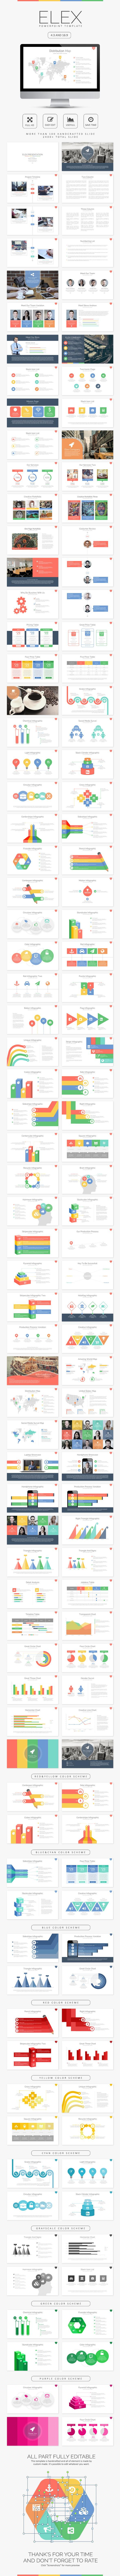 Elex Multipurpose PowerPoint Presentation Template